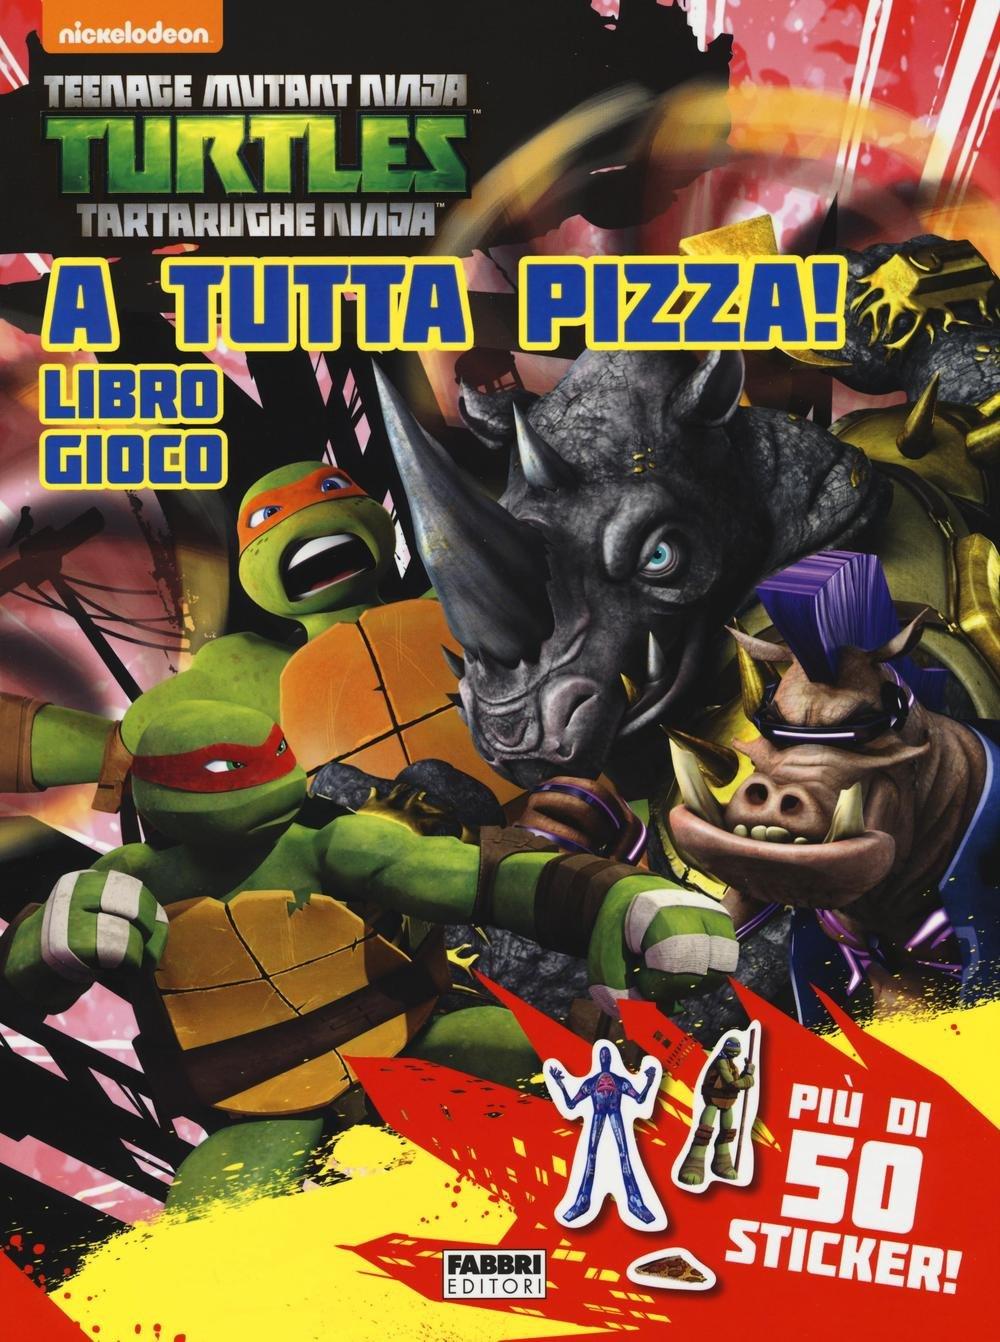 A tutta pizza! Libro gioco. Teenage mutant ninja turtles ...